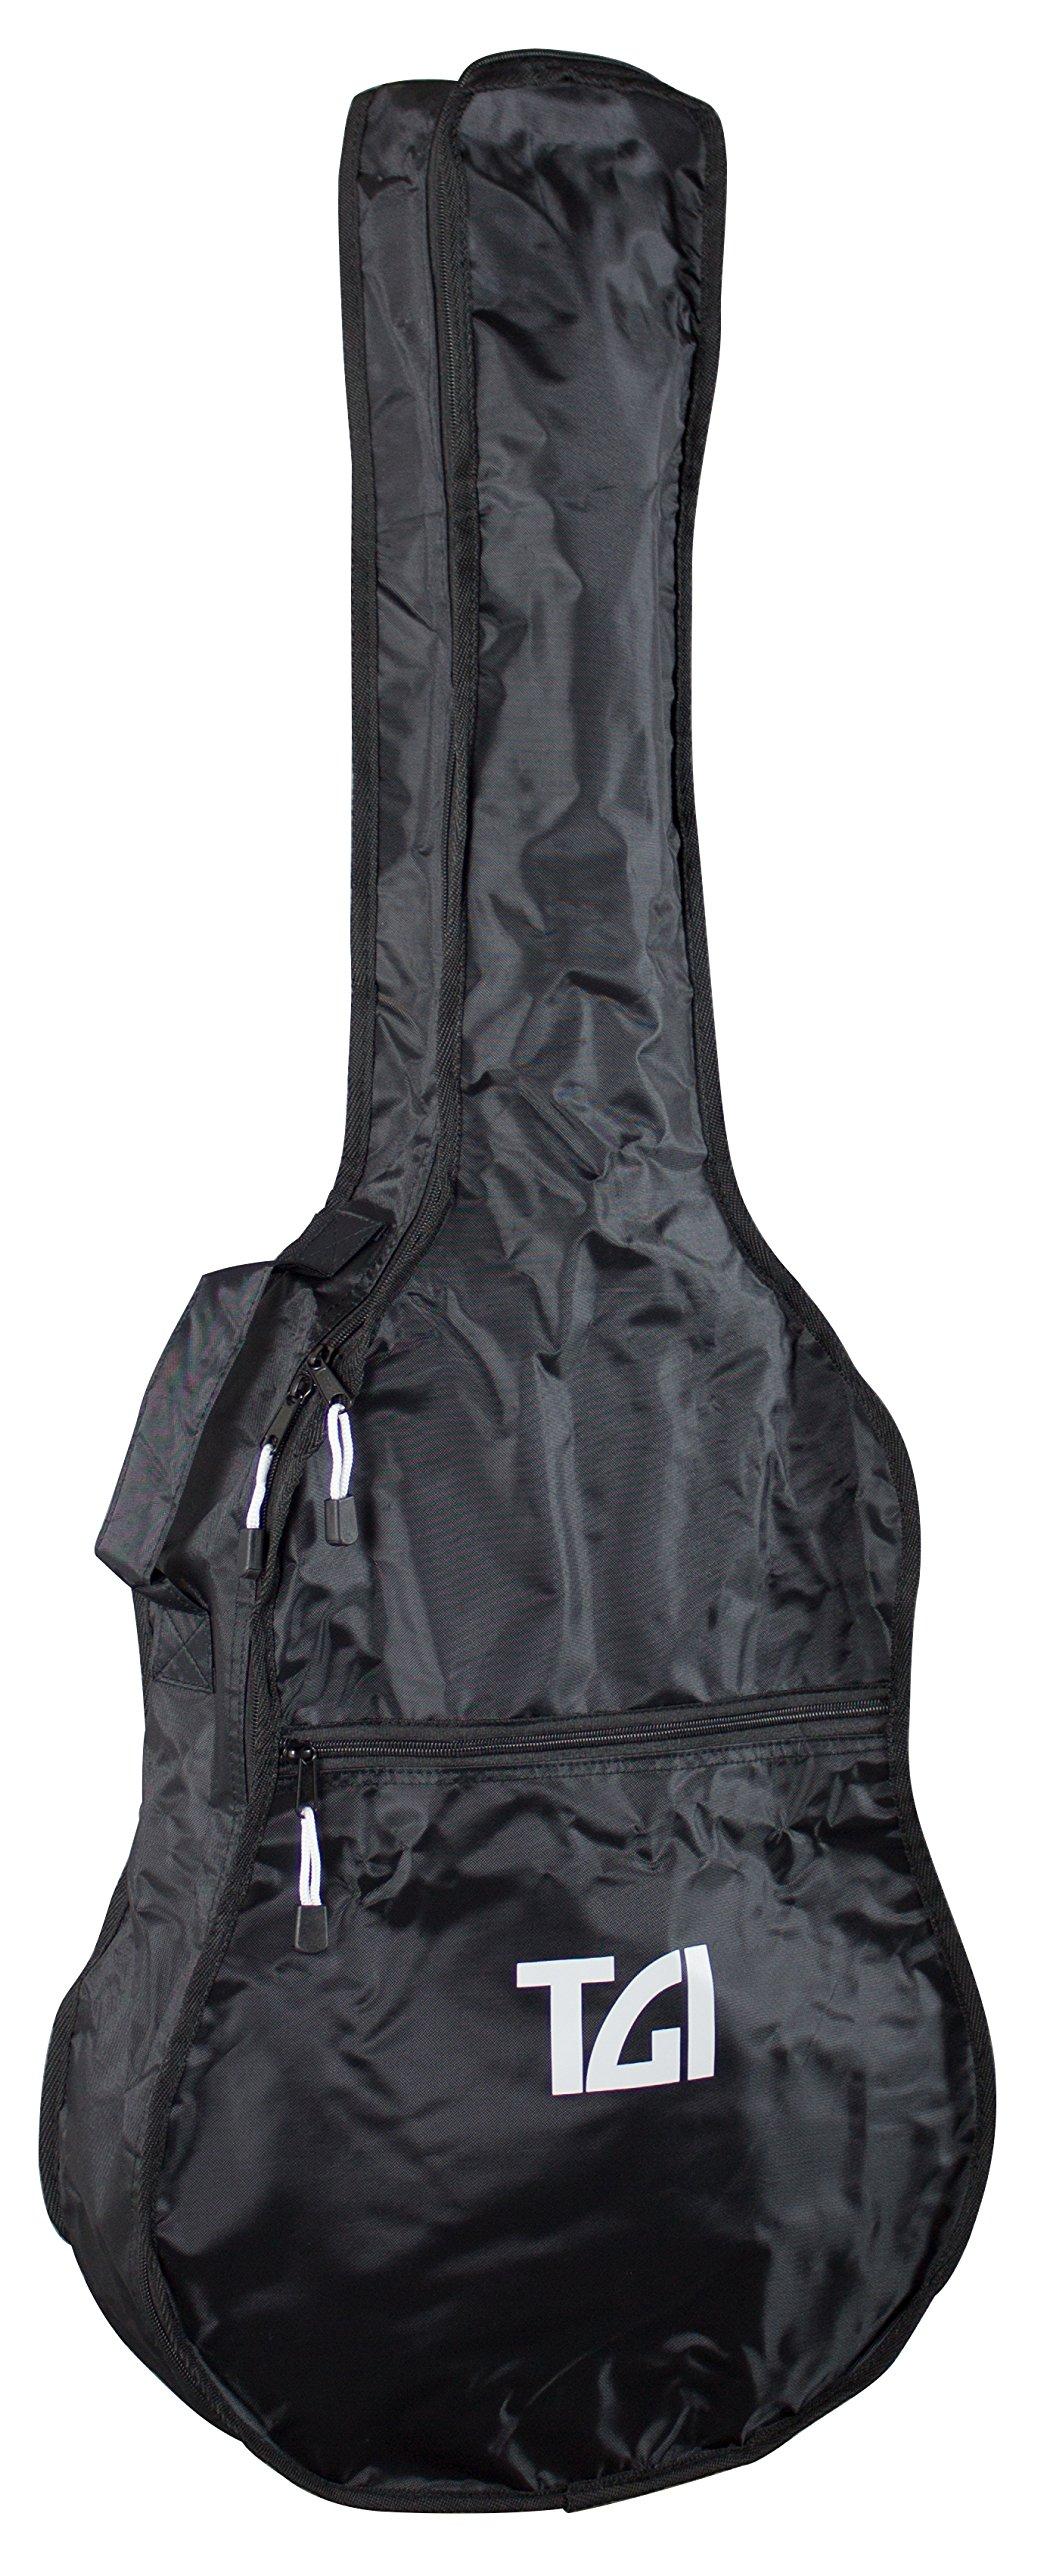 TGI Student GigBag for 1/2 Size Classical Guitar